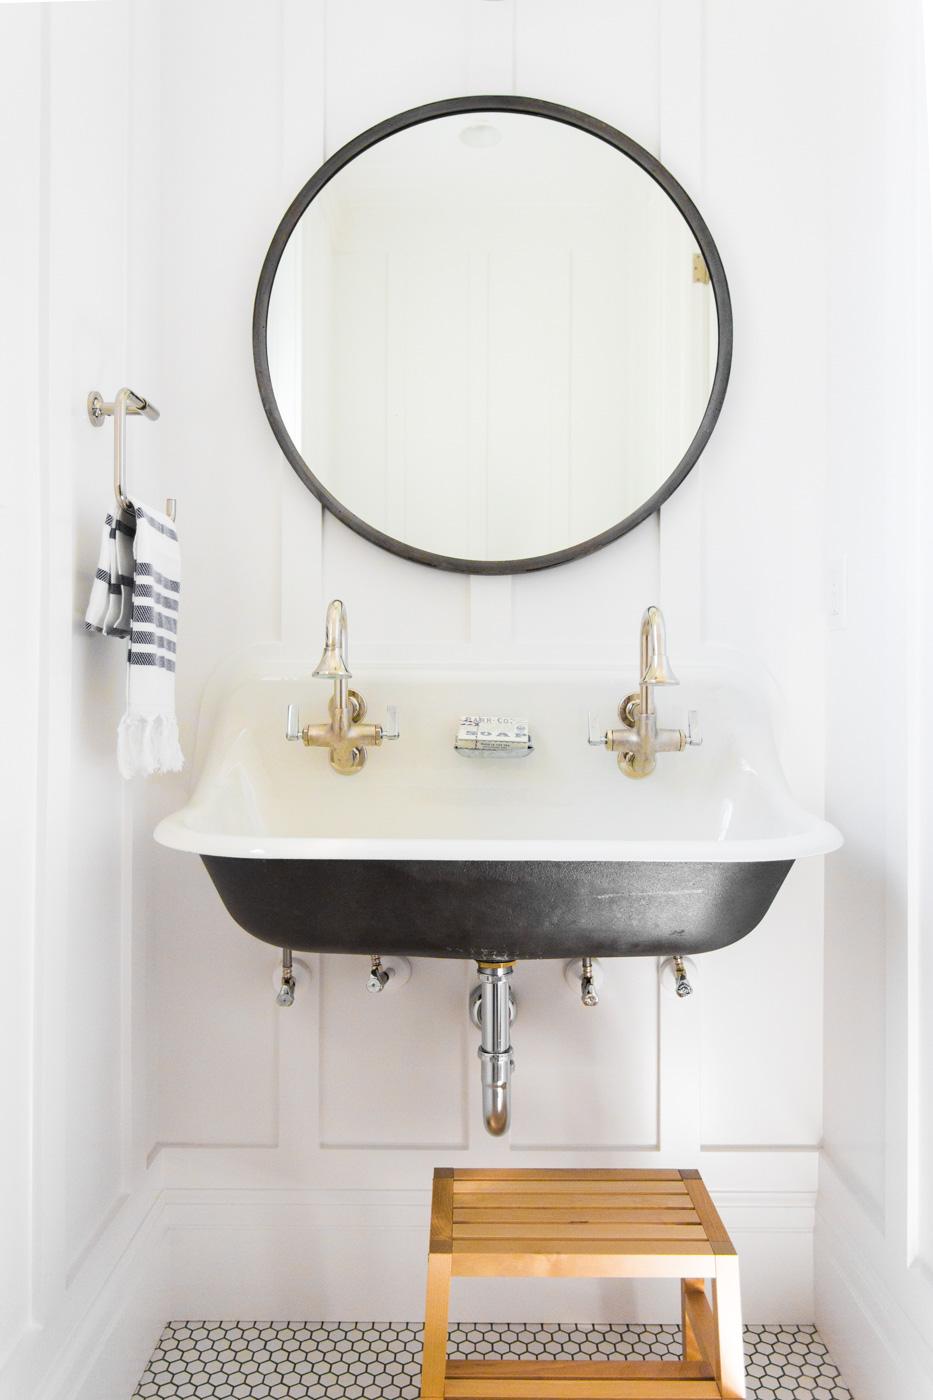 Wooden stepping stool beneath bathroom vanity